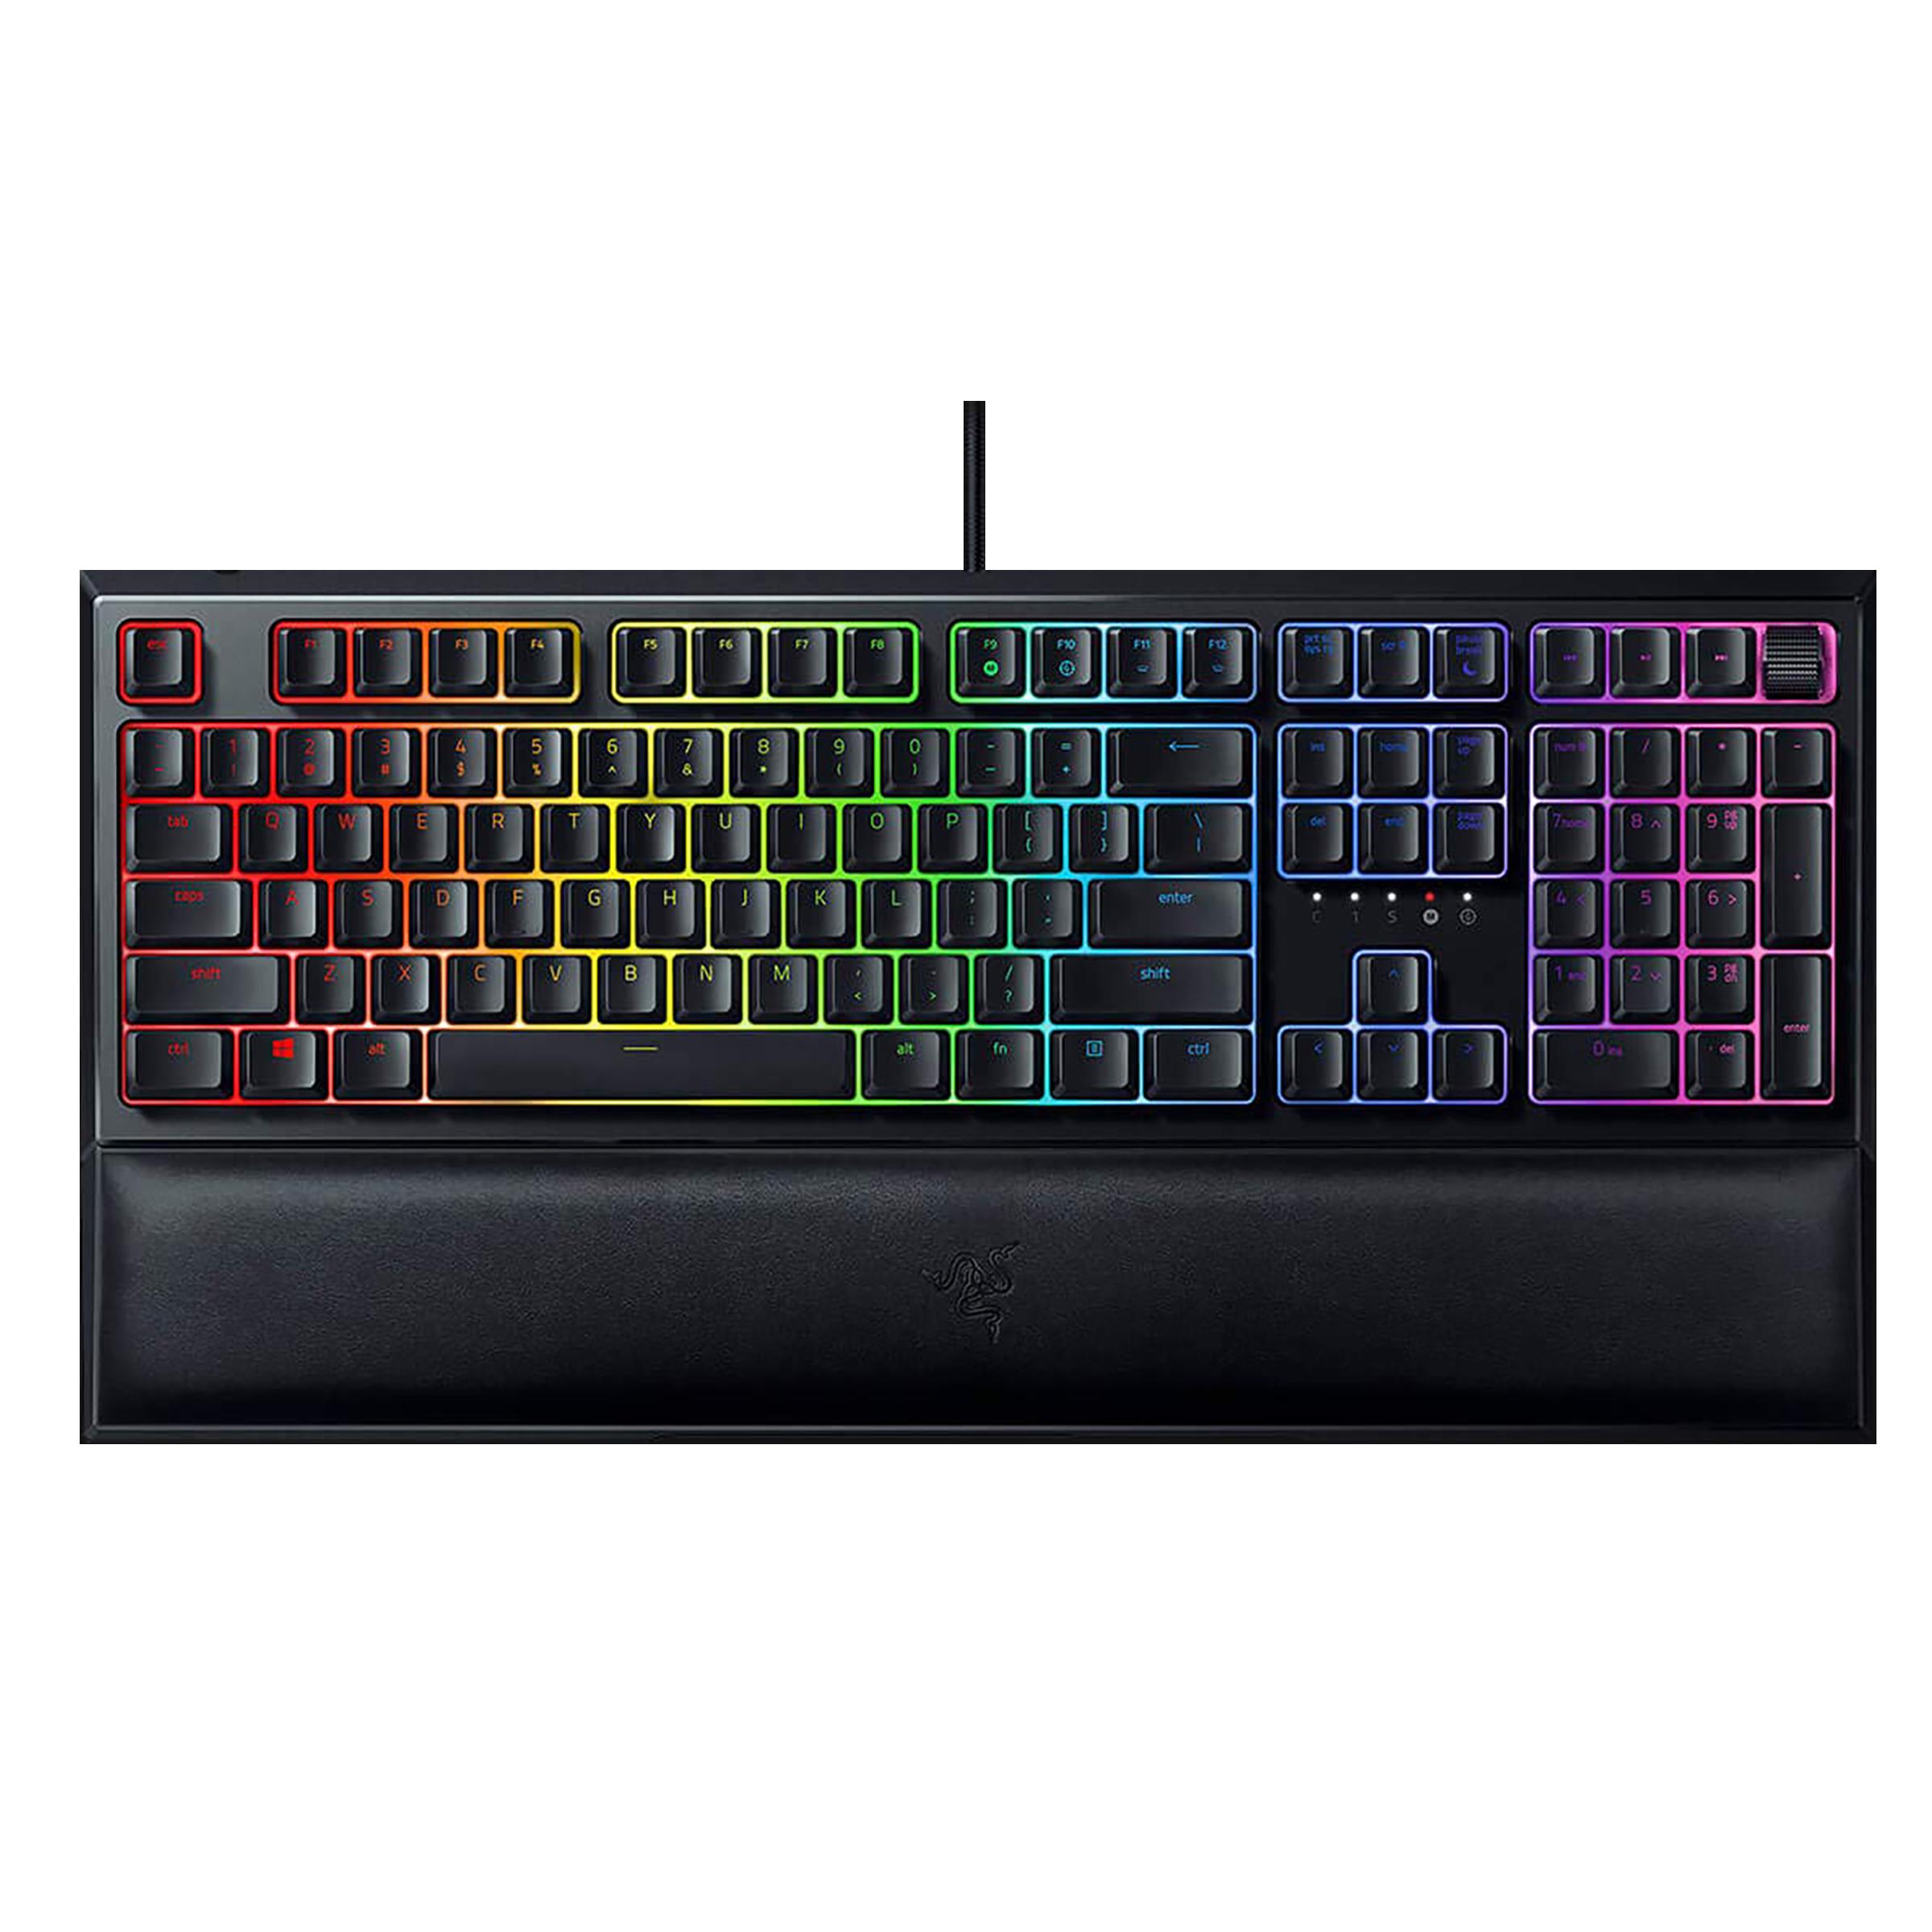 Razer Ornata V2 Wired Gaming Keyboard (Mecha-Membrane Switch, RZ03-03380100-R3M1, Black)_1